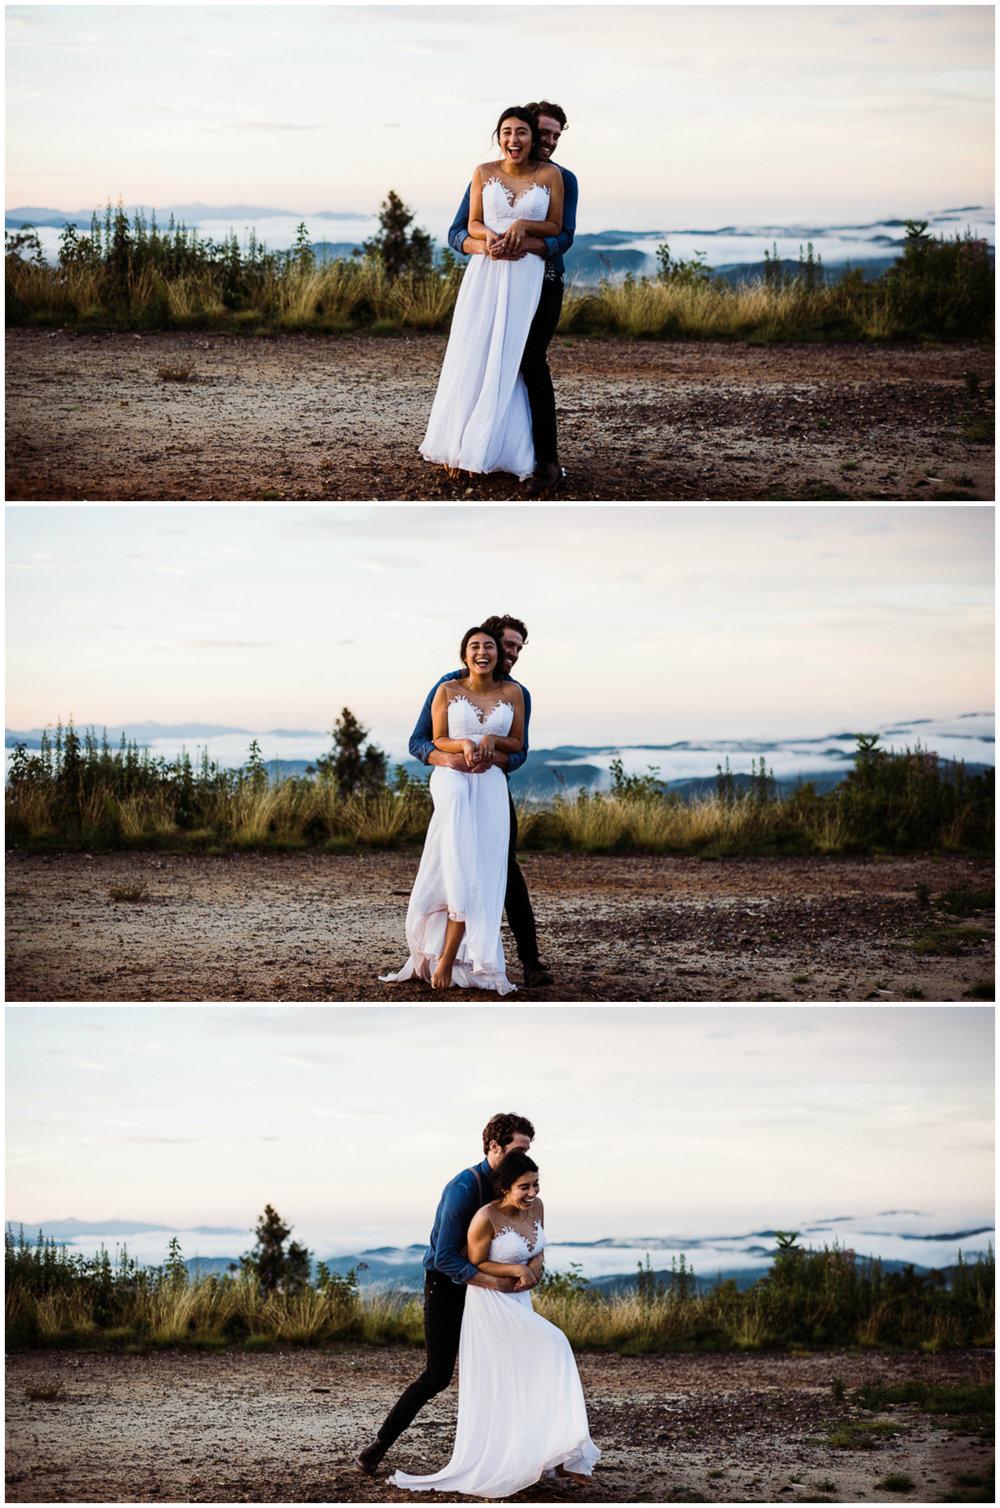 Mountain Wedding, Mountain Elopement, Wedding Pictures 8.jpg